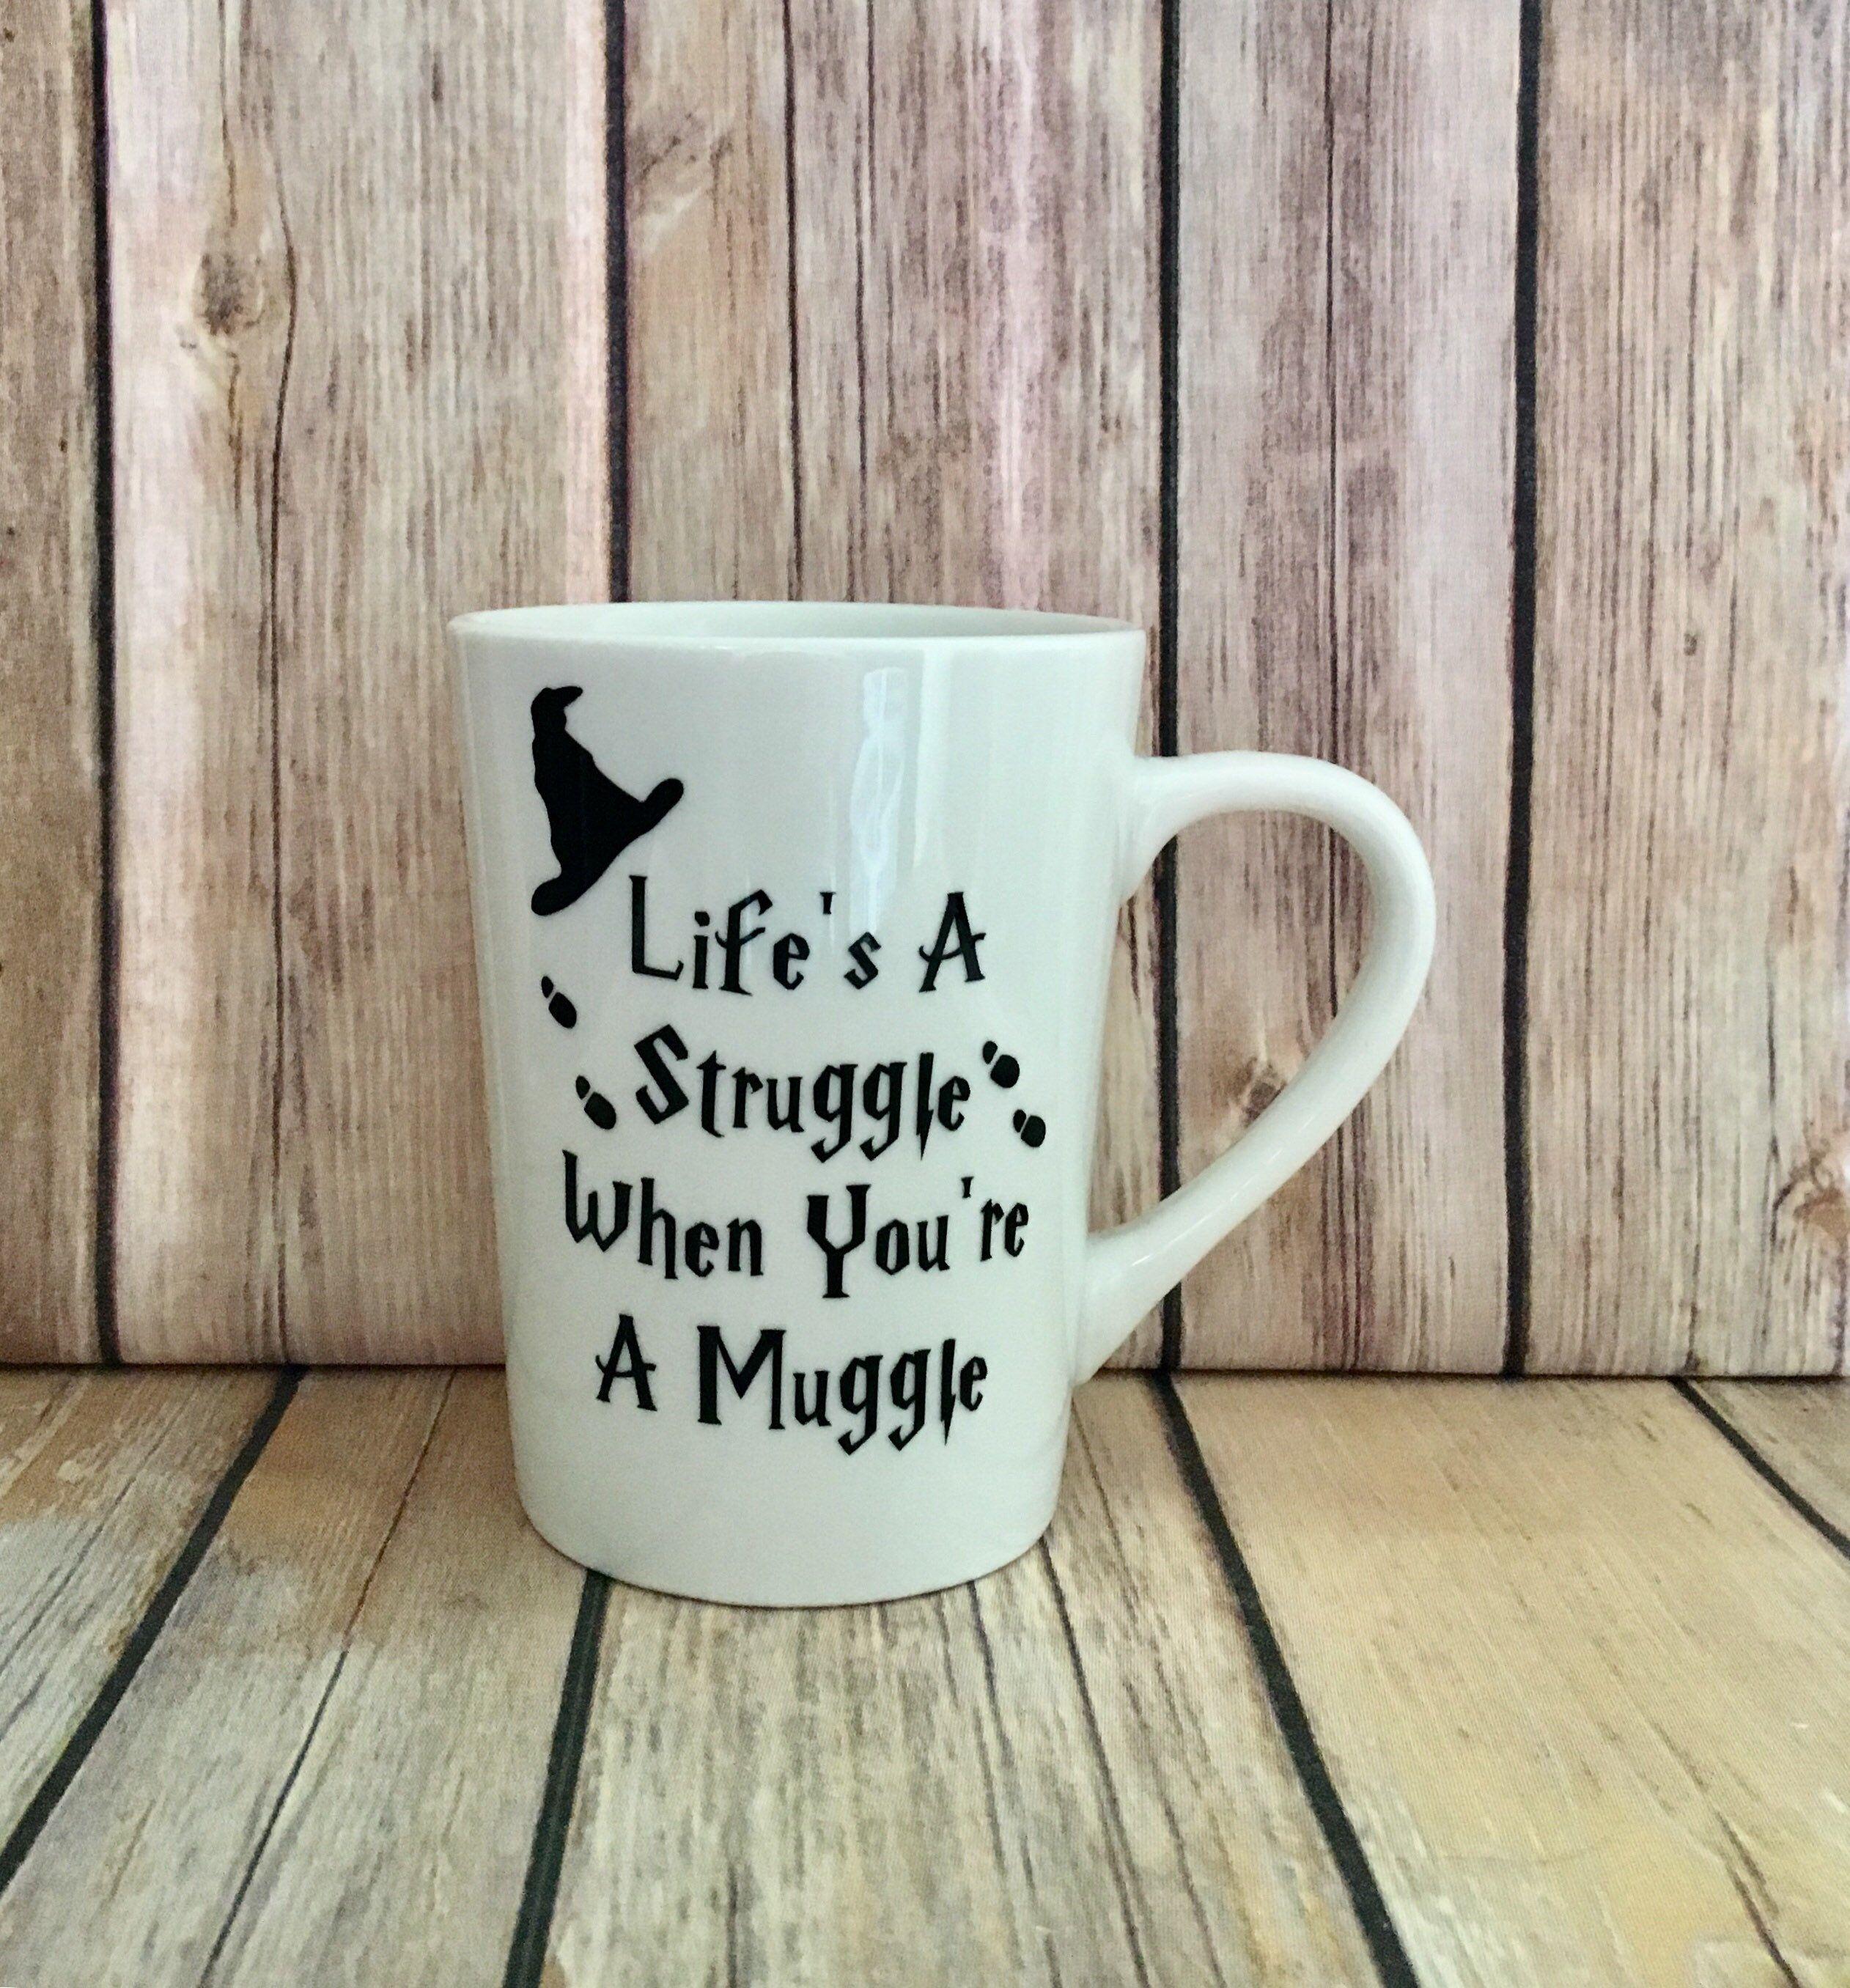 Potter On Harry Coffee By Muggin' Mugs Pin Mean iOZPXuk